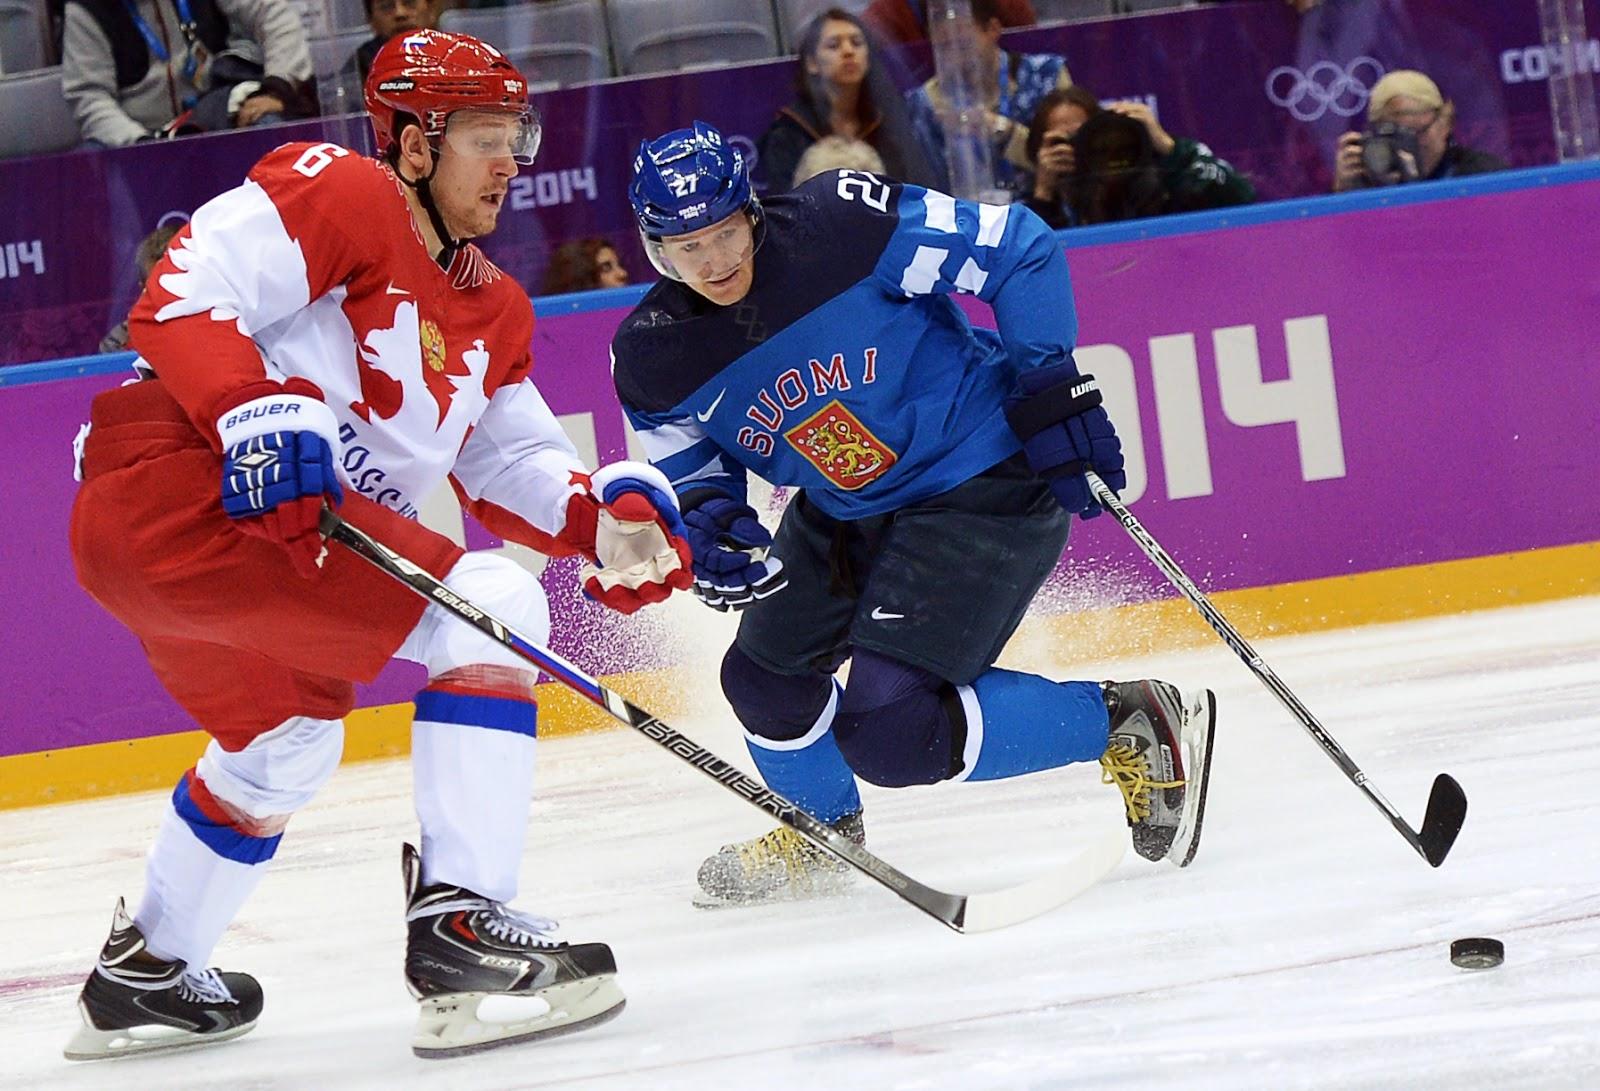 олимпиада 2014 хоккей россия какое место заняла